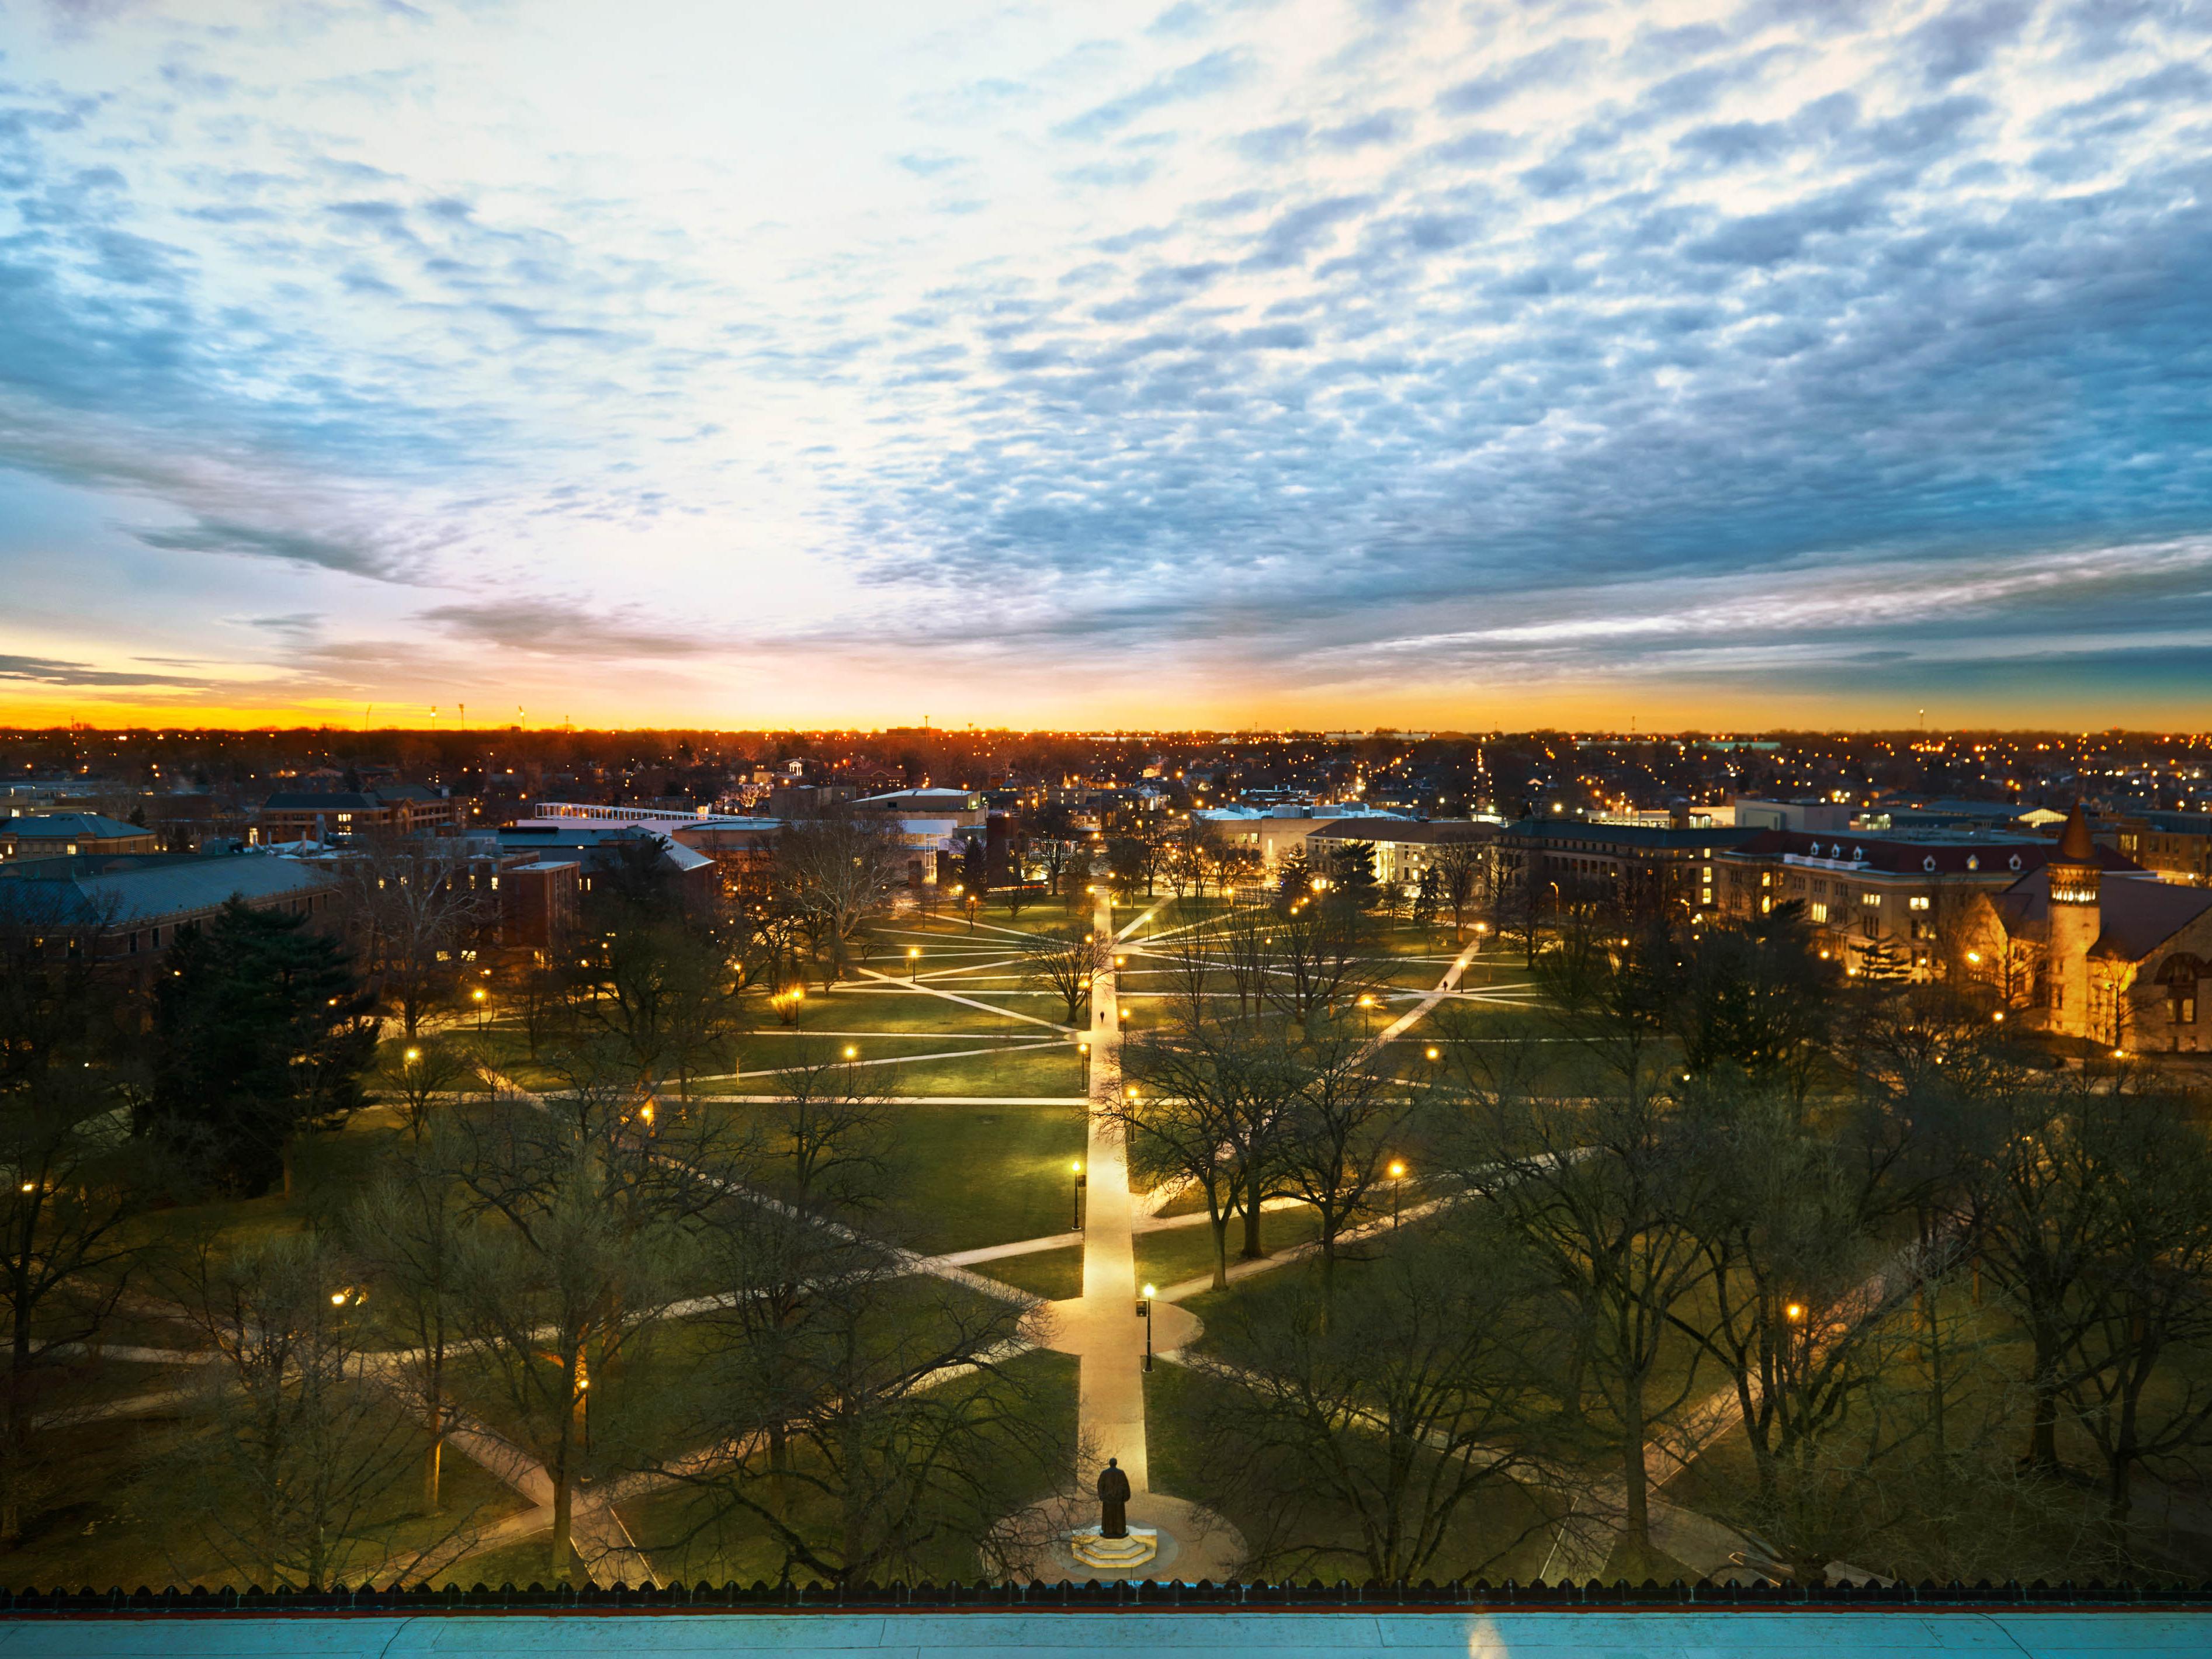 Images The Ohio State University